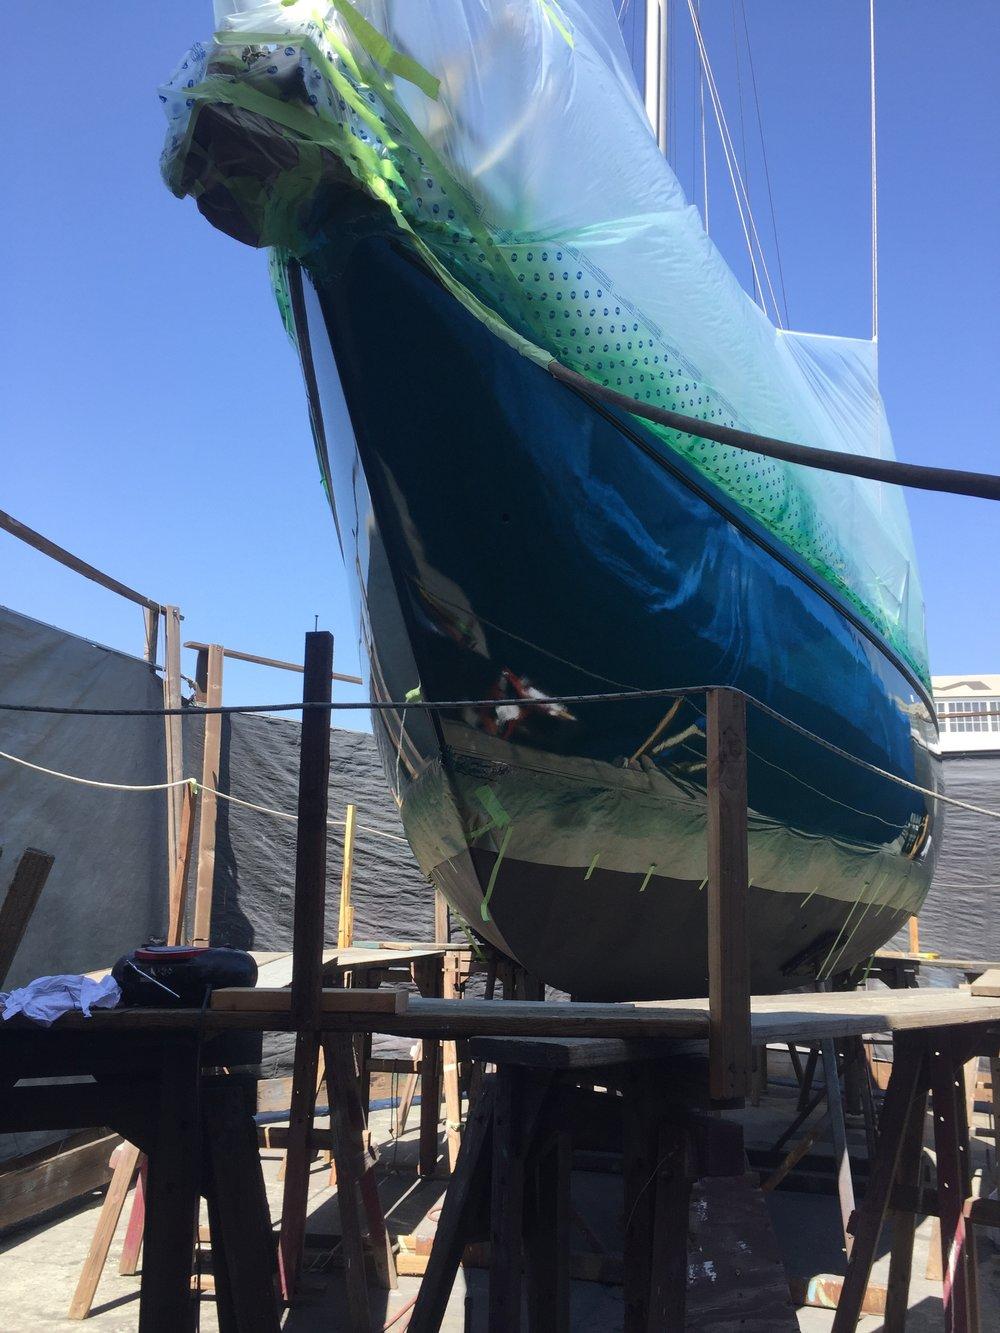 the-finest-yacht-coating-service-svendsens-bay-marine-sf-bay-area.JPG